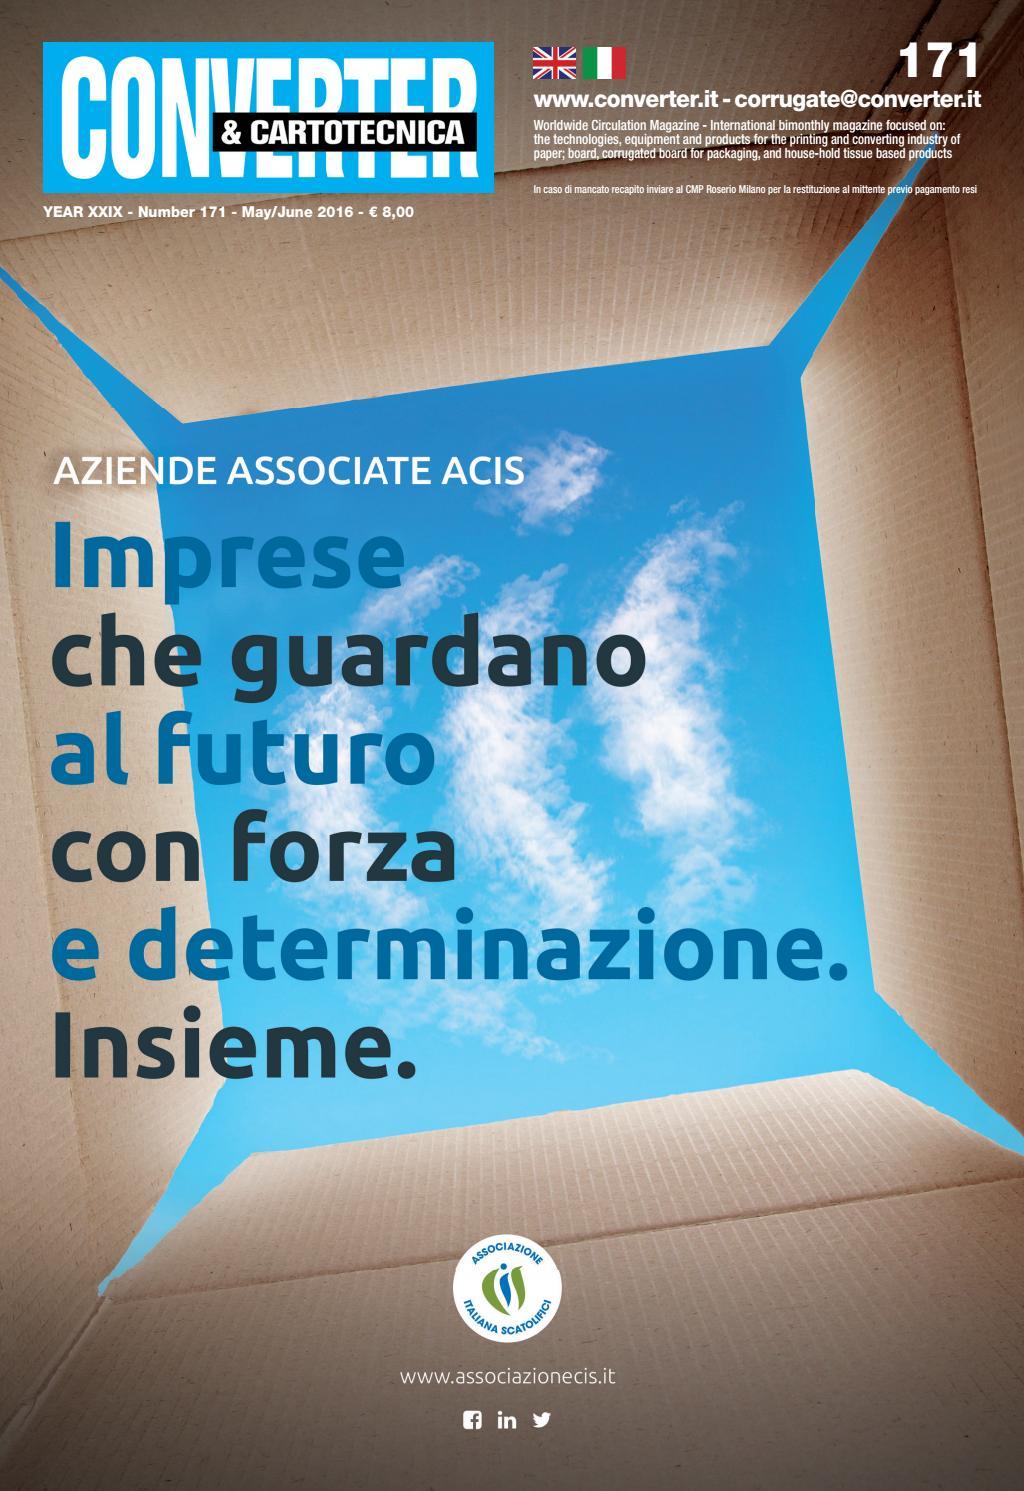 Converting Acimga Technology at Drupa by Edizioni Dativo Stefano ...